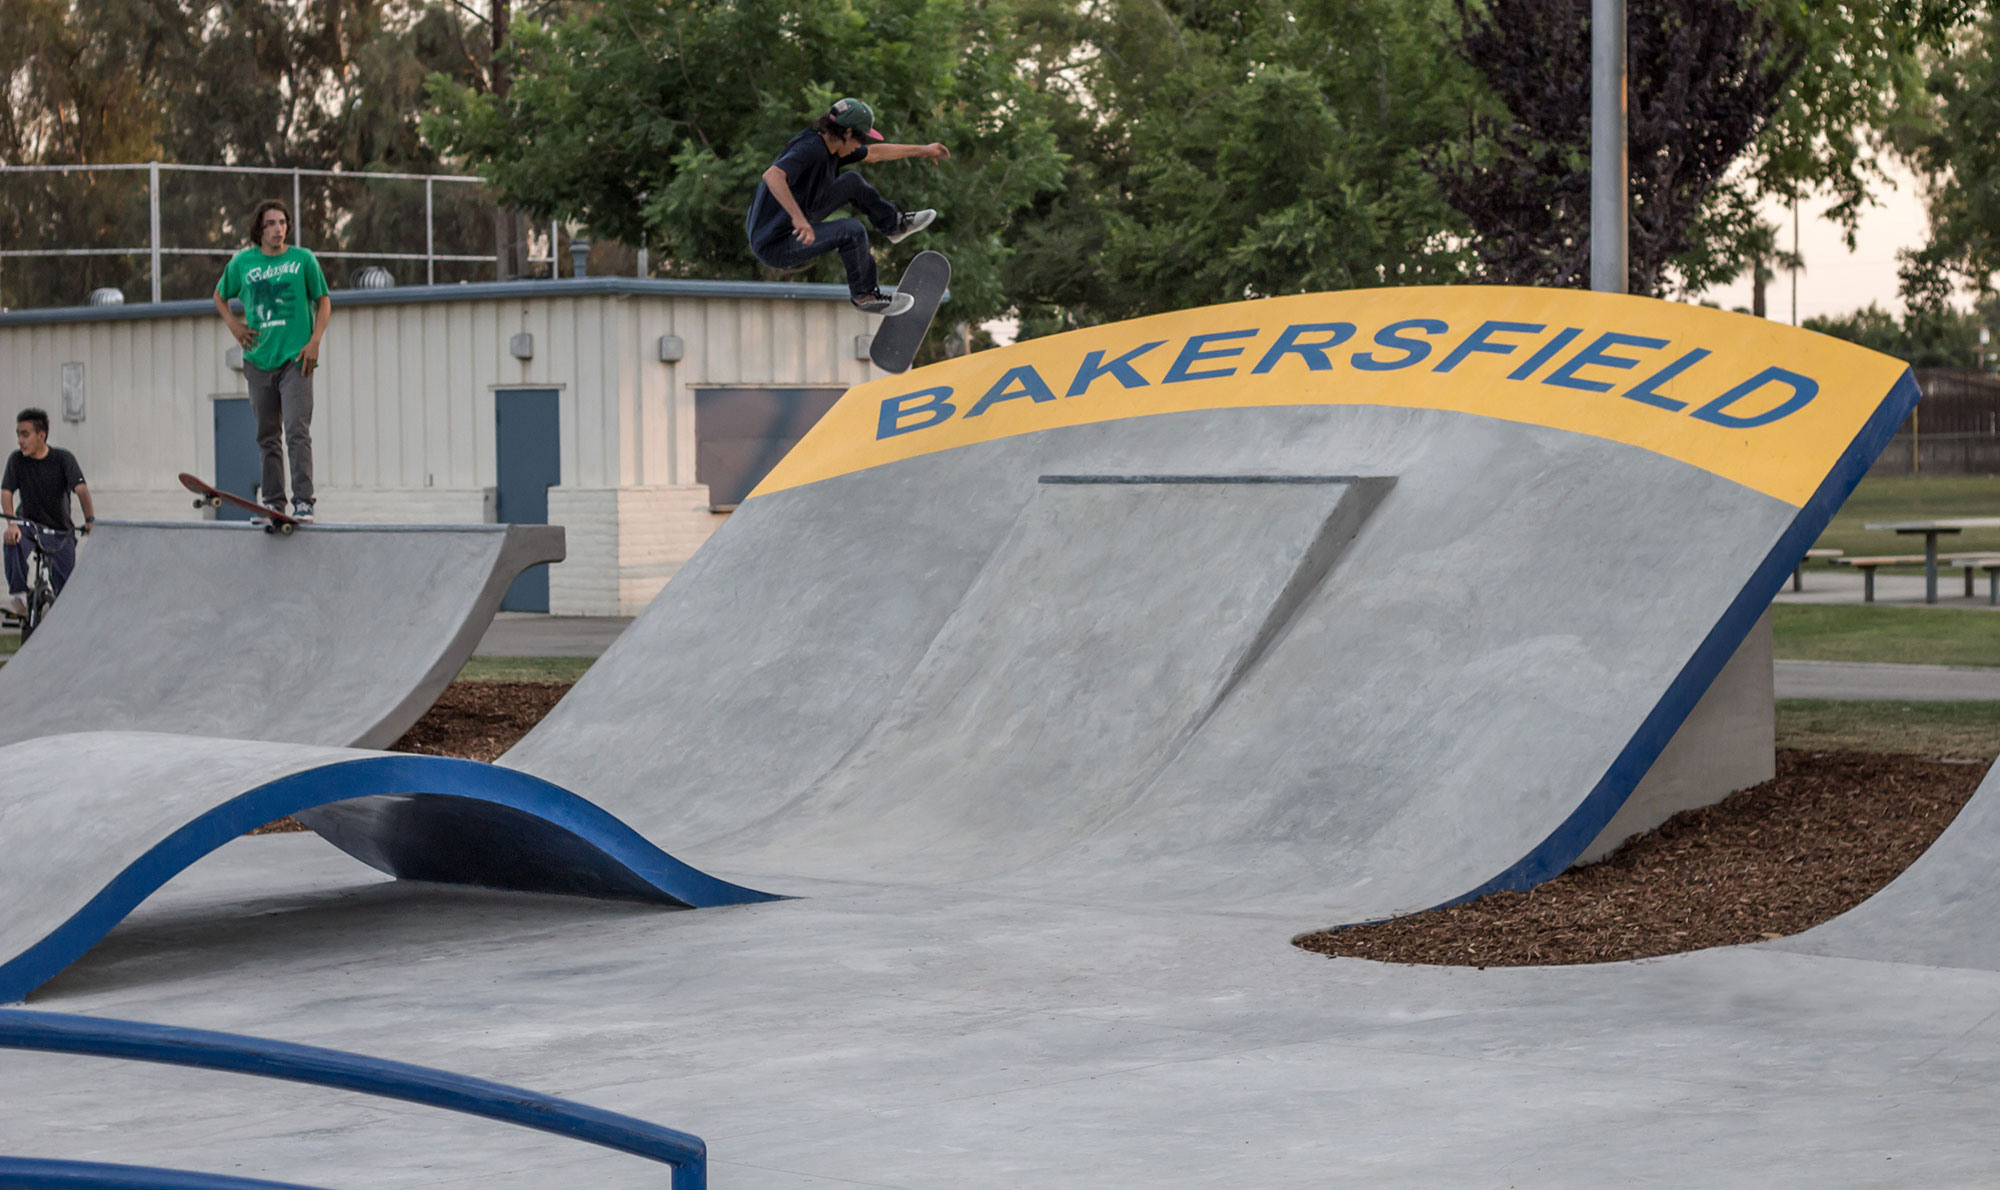 planz park, bakersfield, california